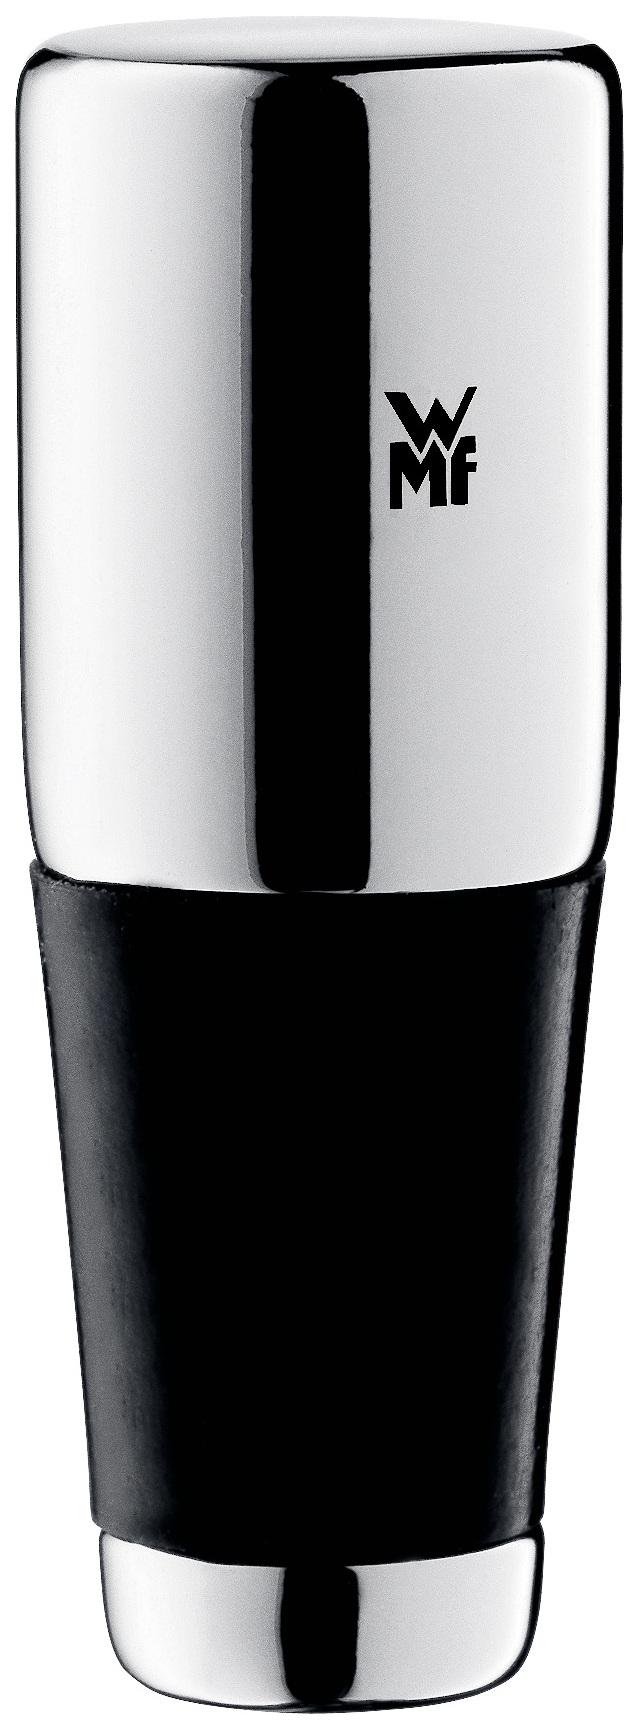 Пробка для бутылок WMF Vino 3201000639